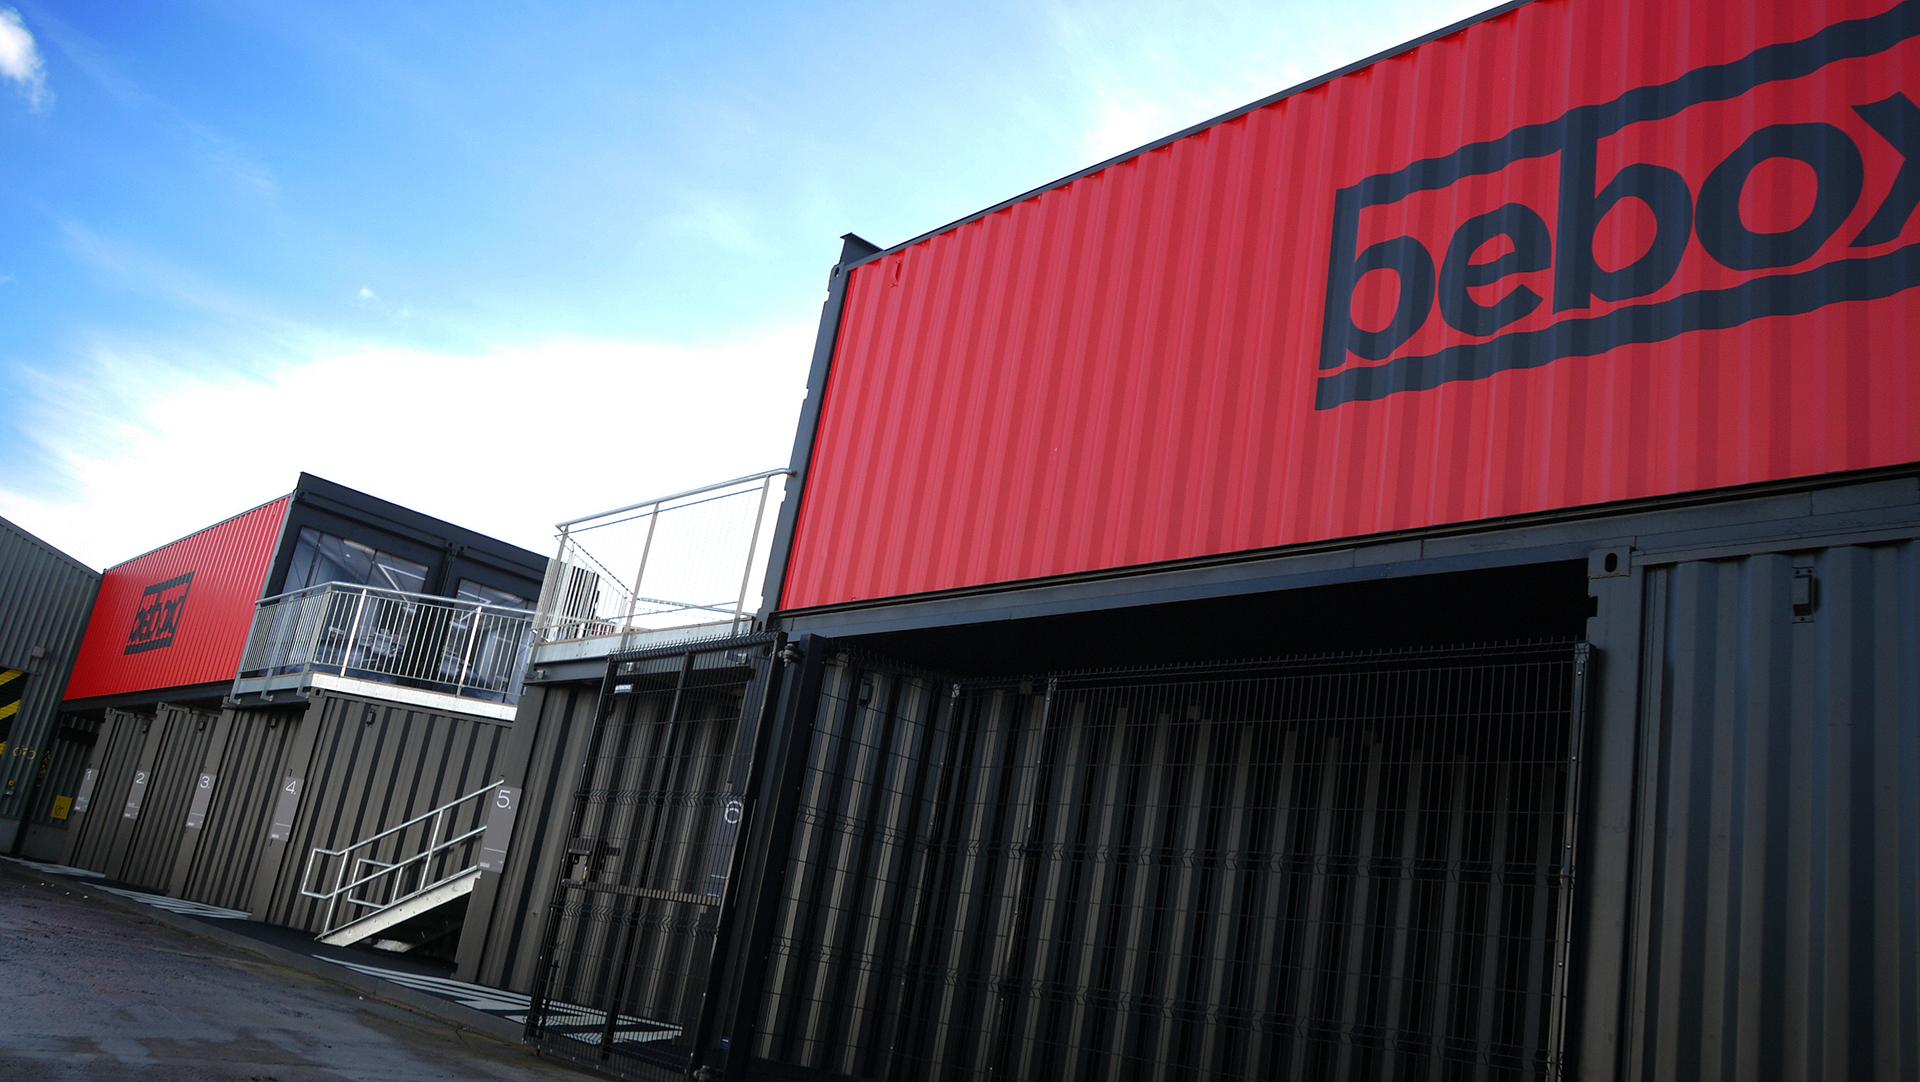 Bebox exterior 2